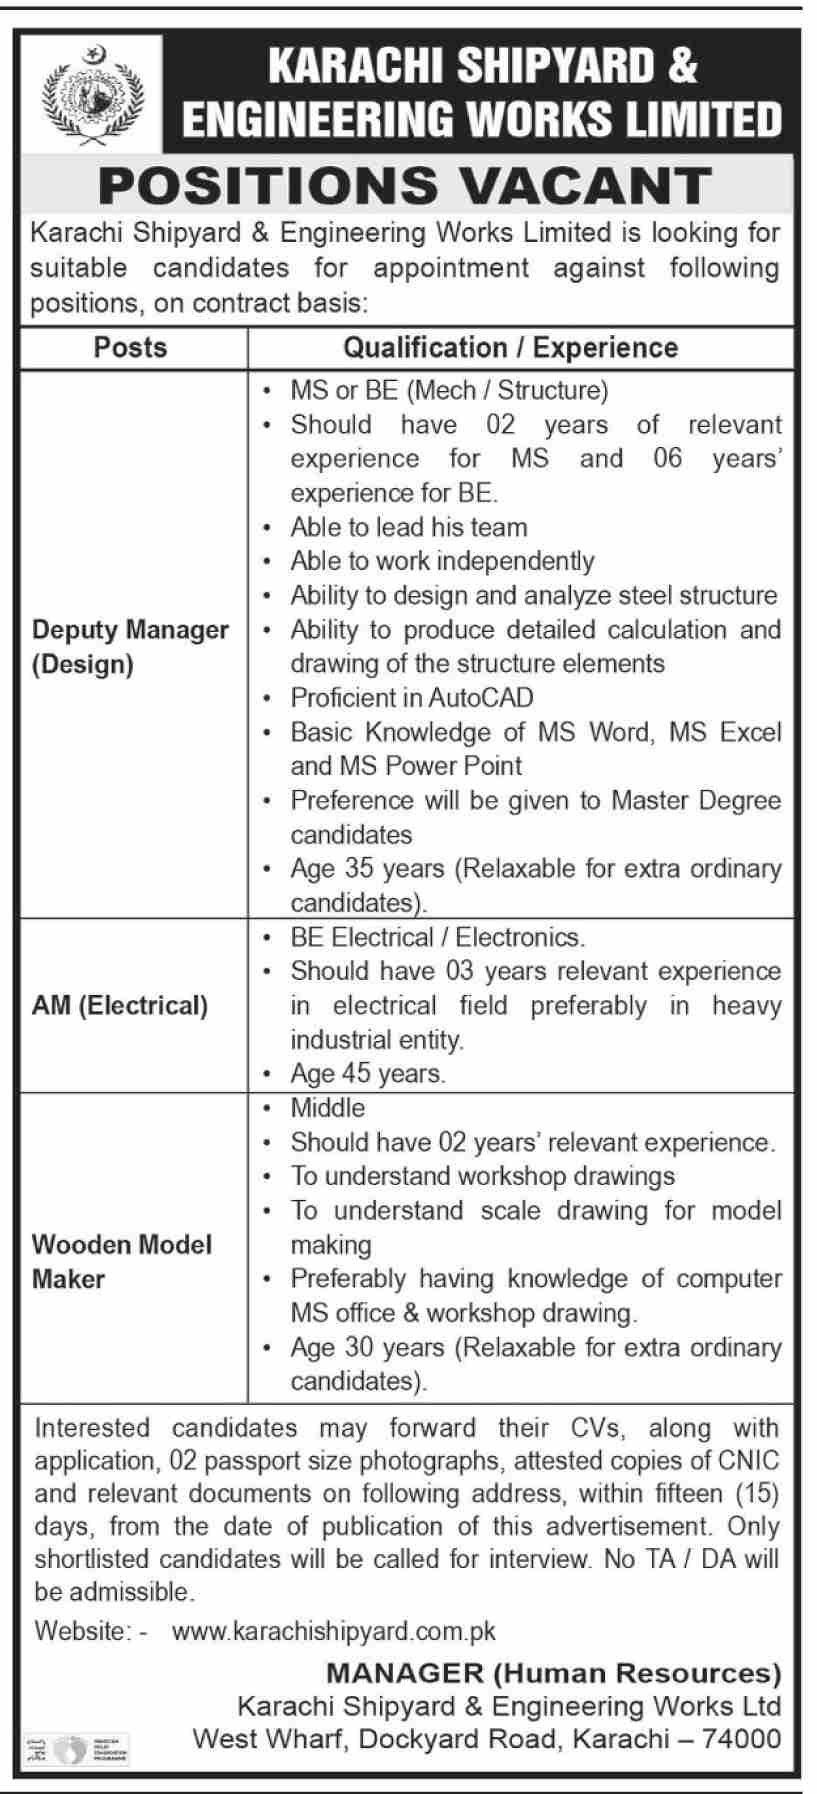 Karachi Shipyard & Engineering Works Limited Jobs 2020